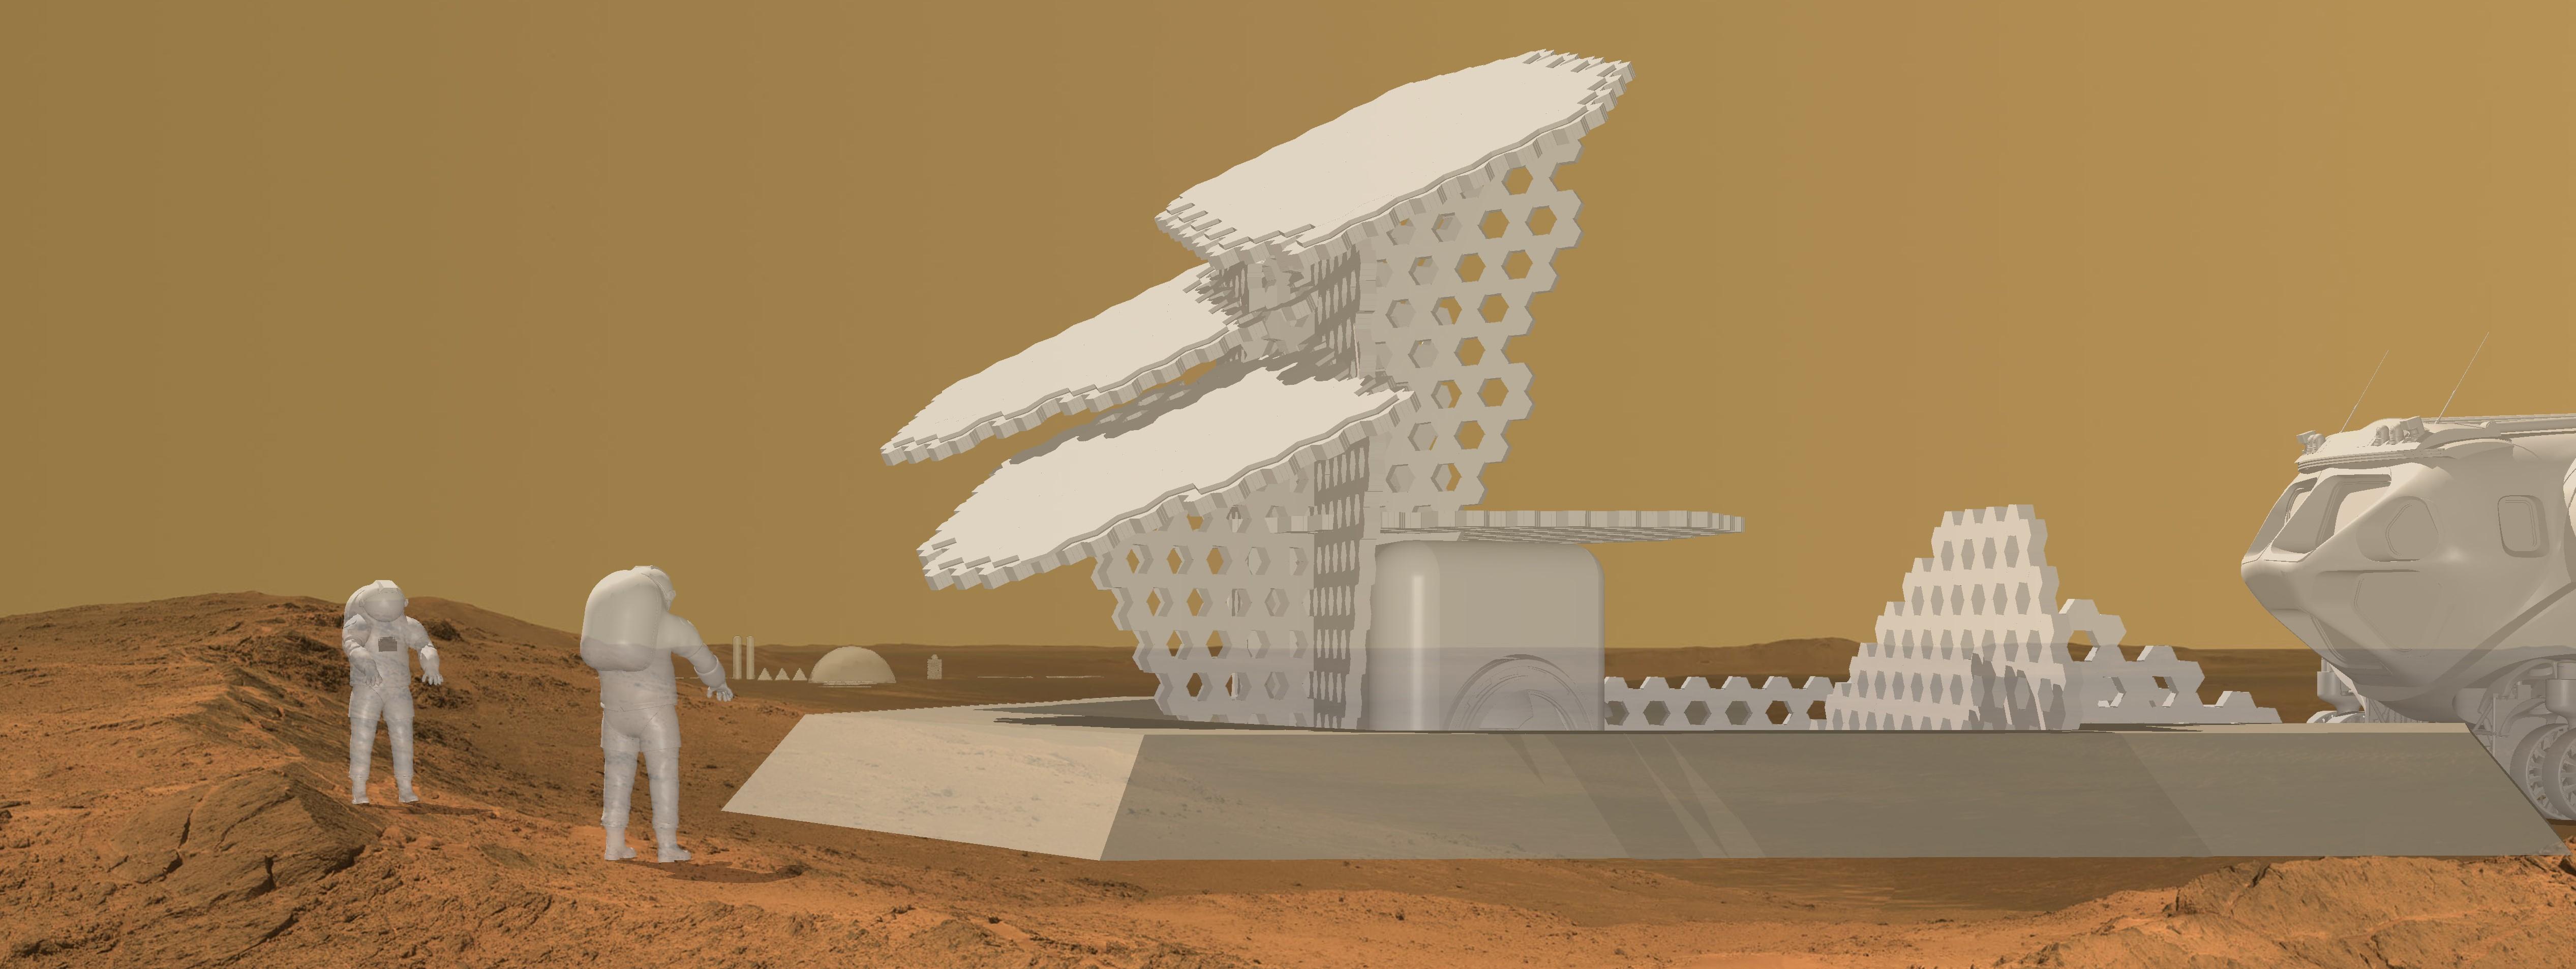 Masonry Charging Station Mars